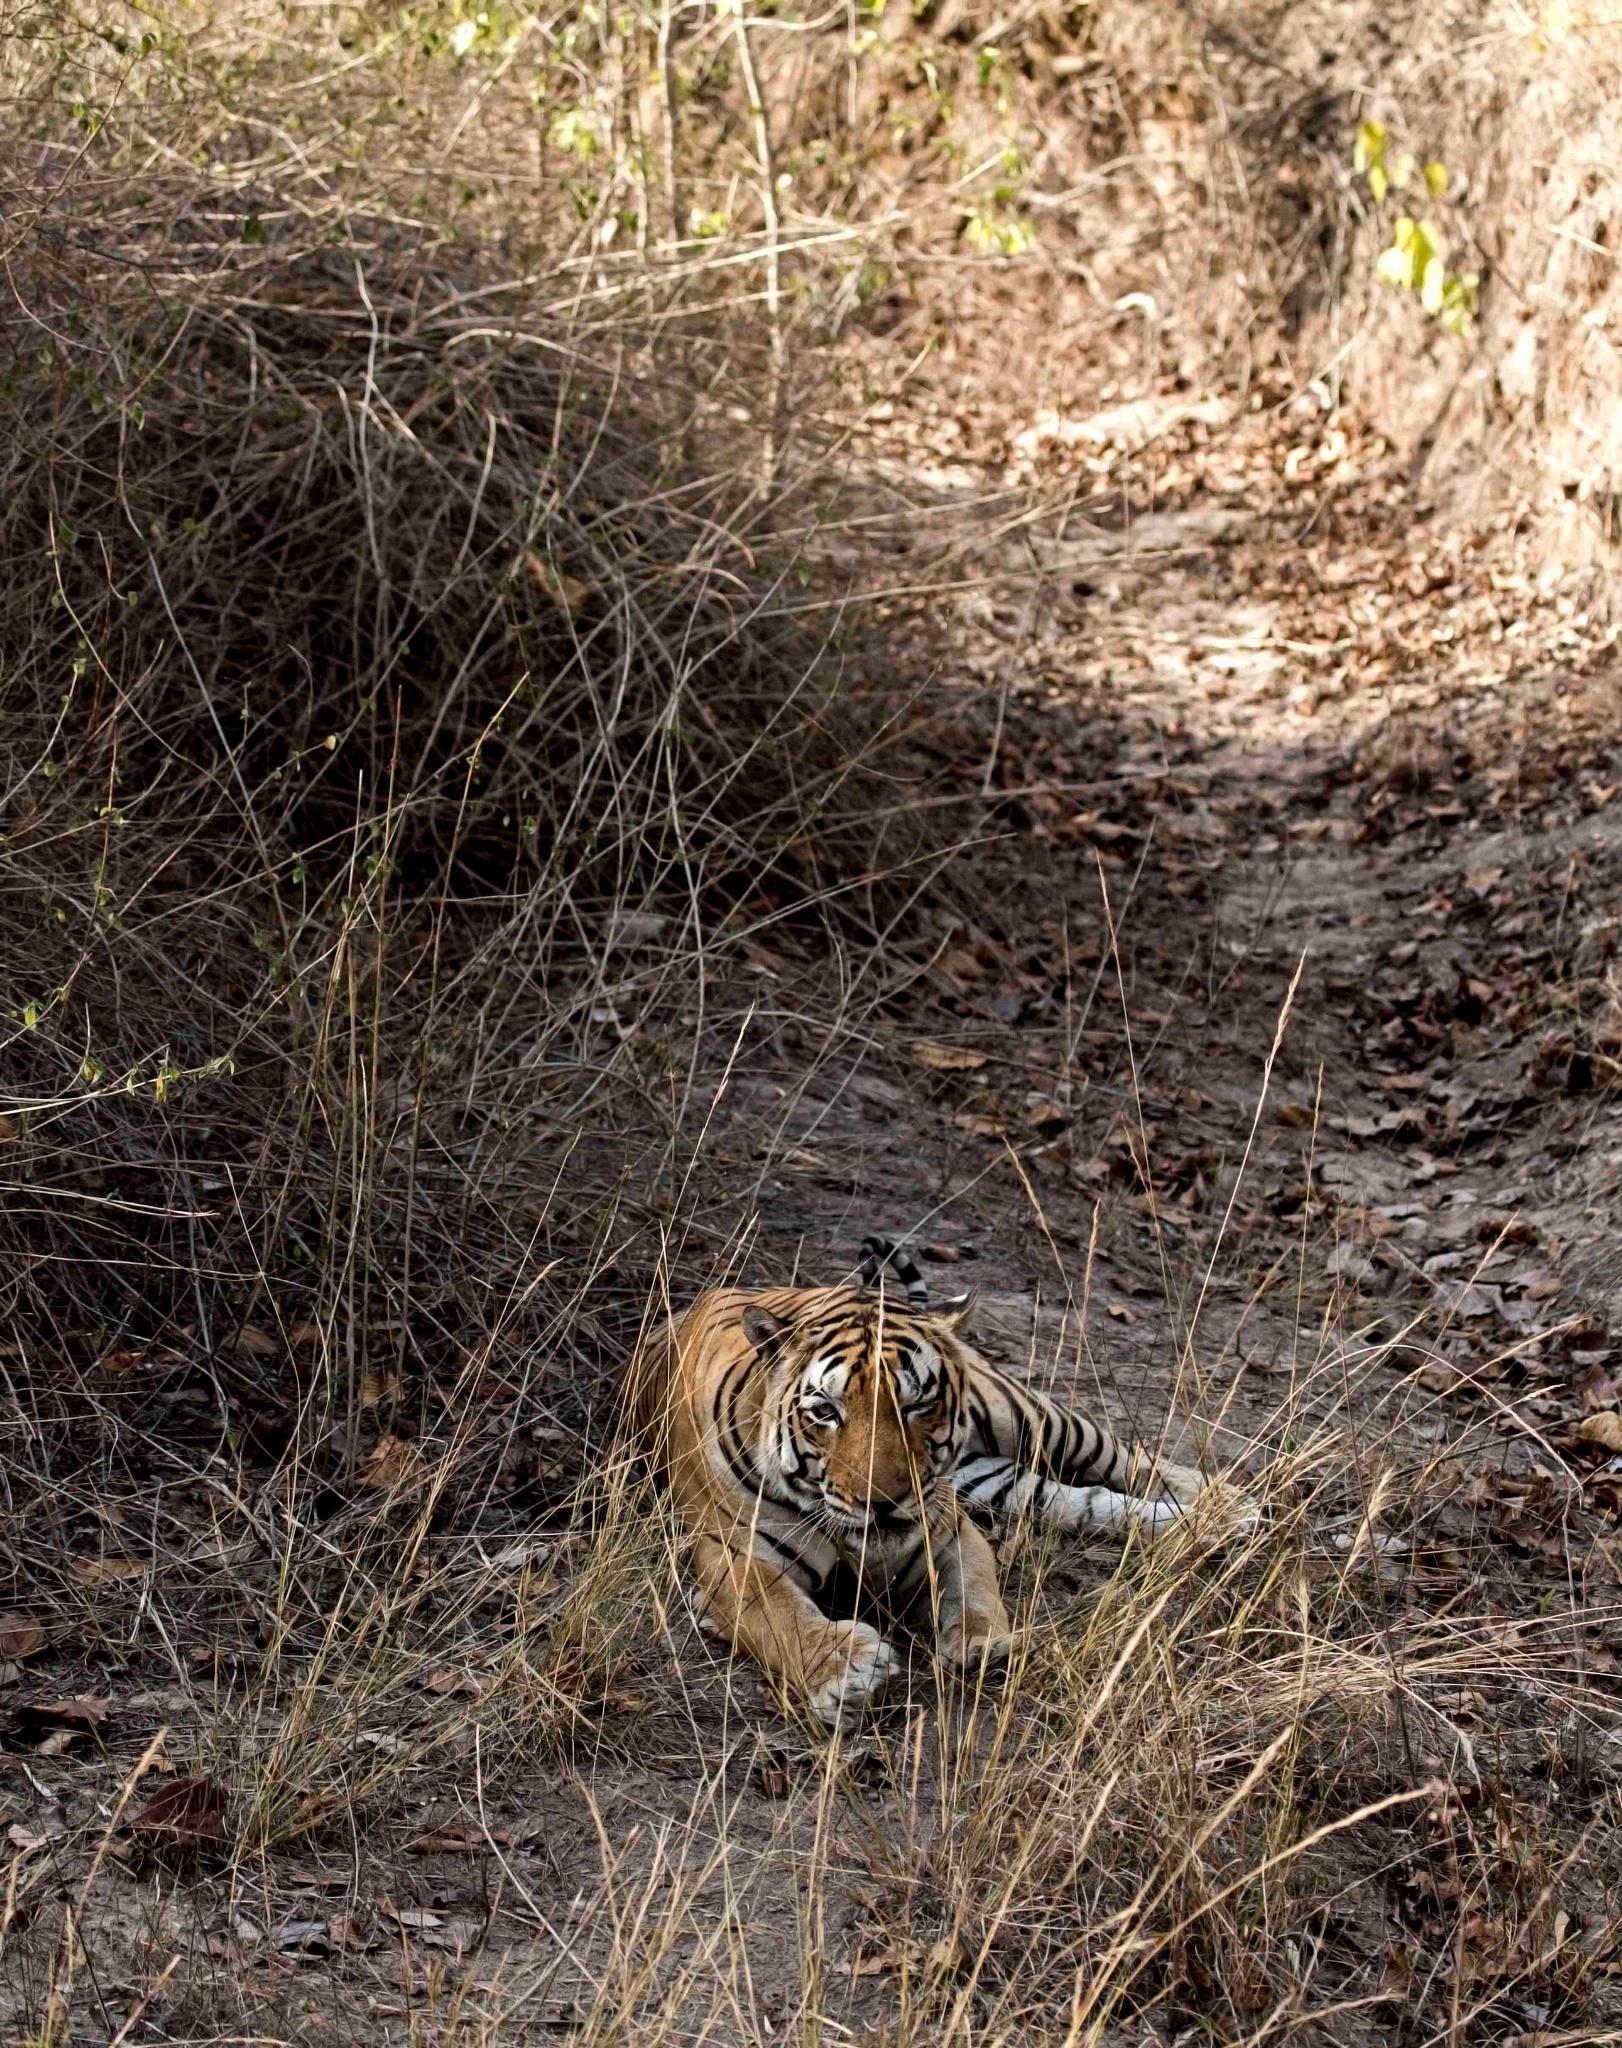 _ELUSIVE!!!! male tiger..._ by guran60